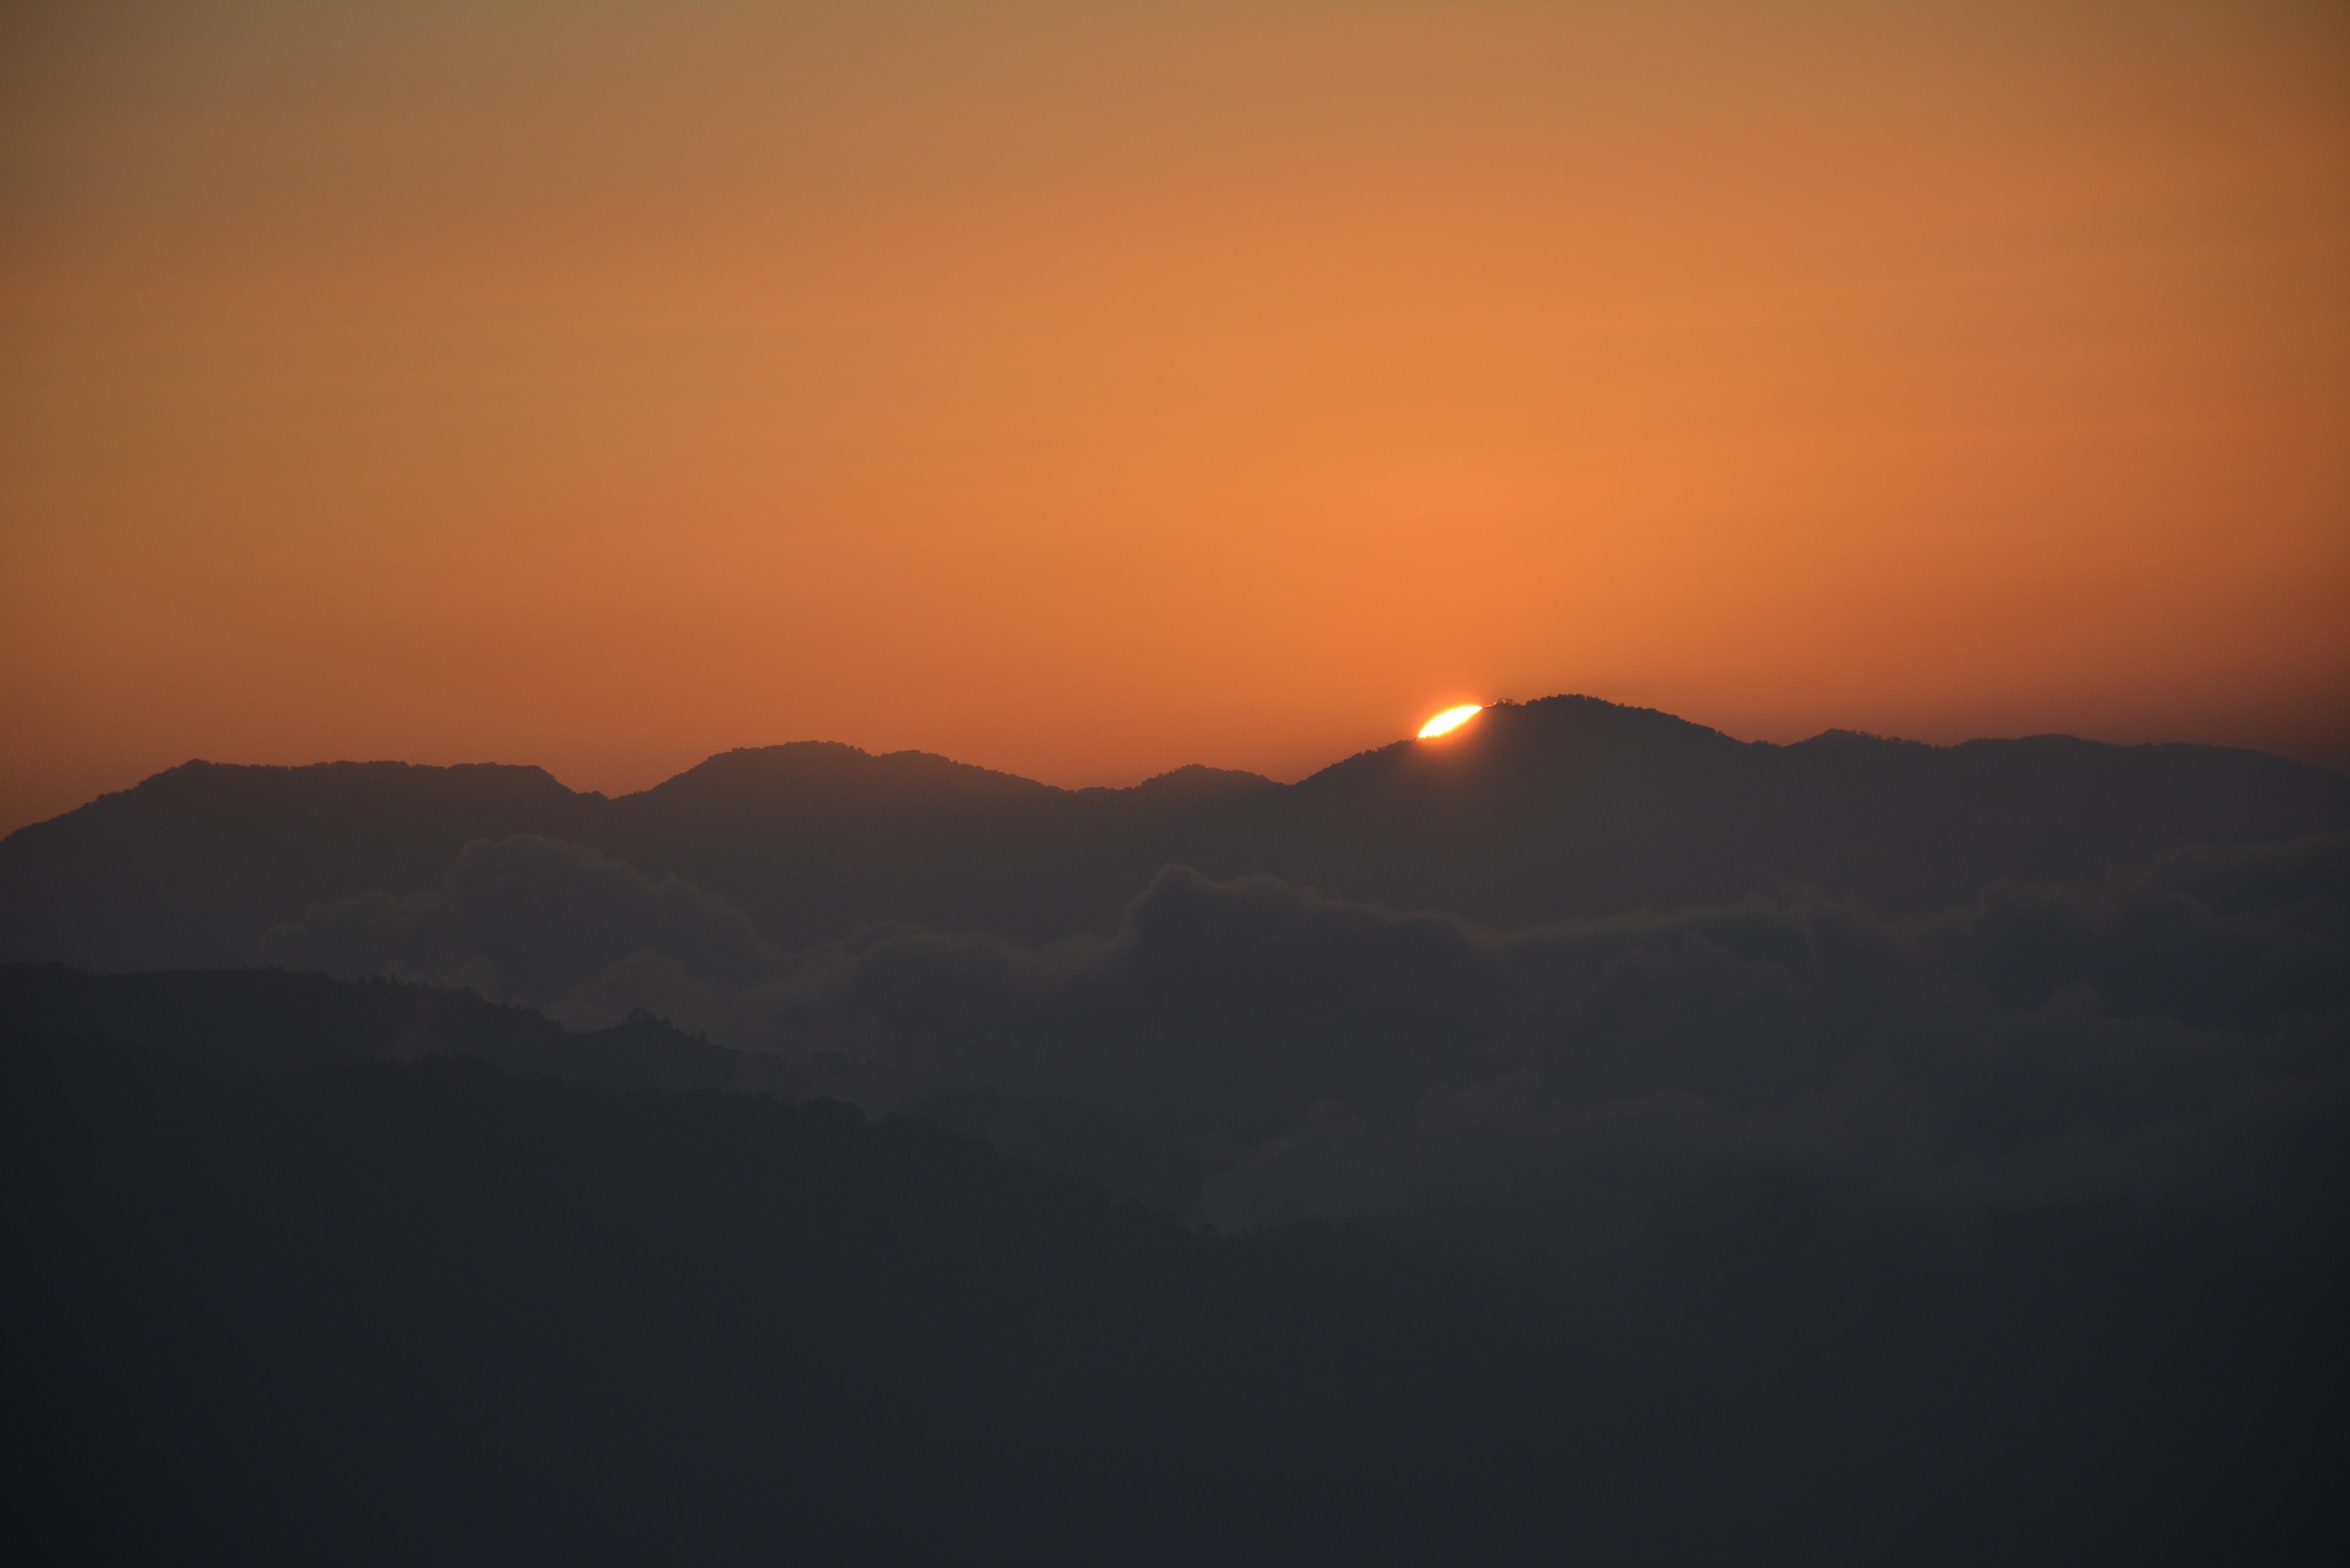 sun setting behind mountain ranges